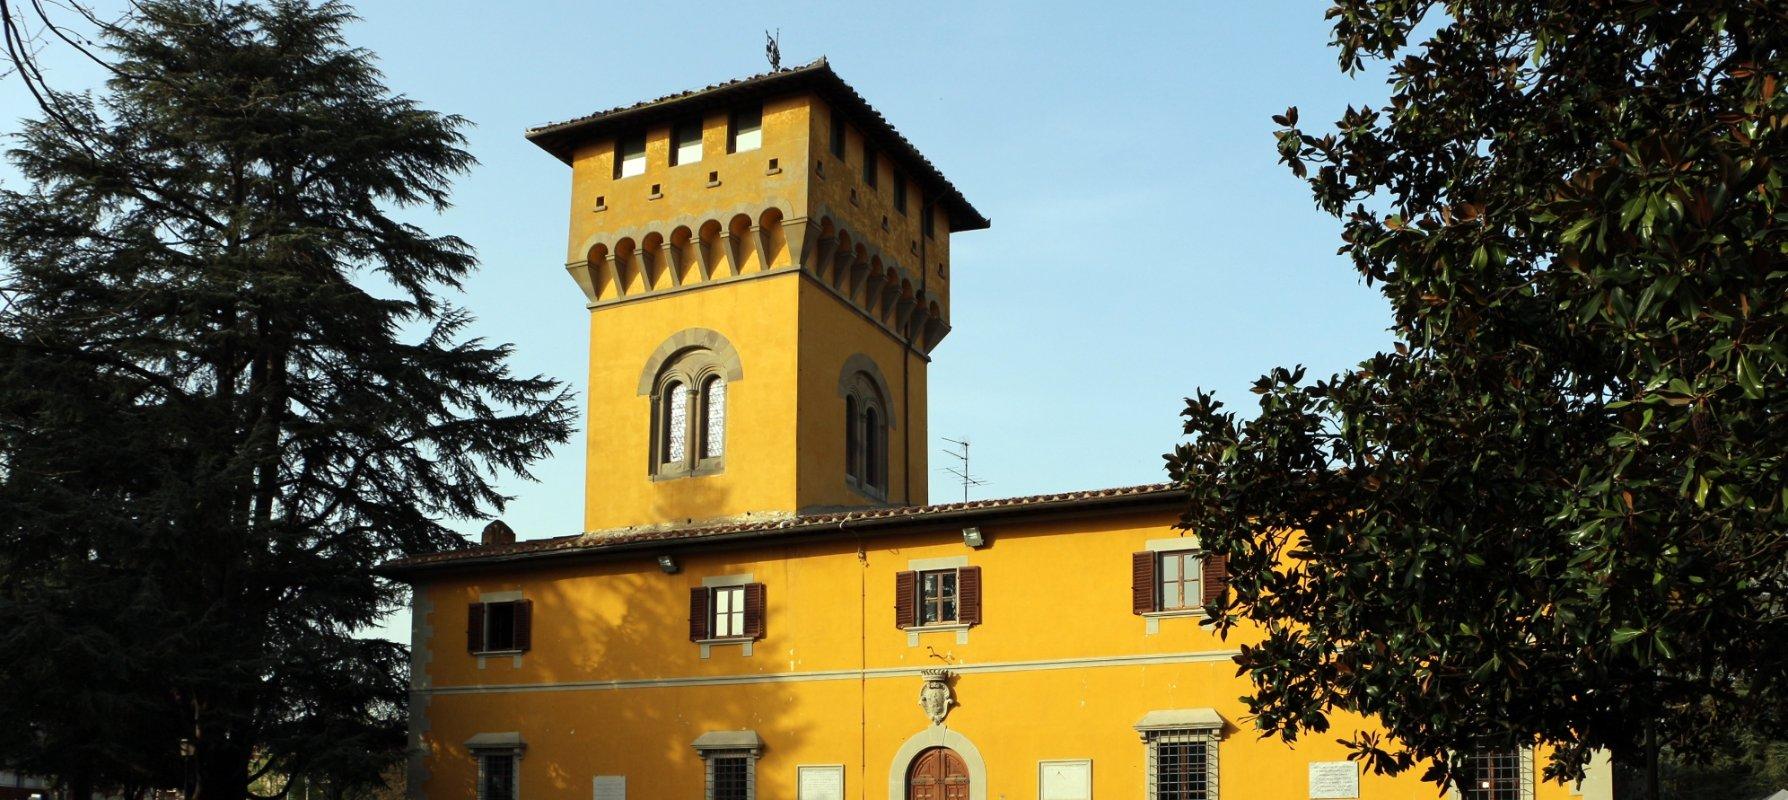 Borgo san lorenzo visit tuscany borgo san lorenzo dailygadgetfo Choice Image